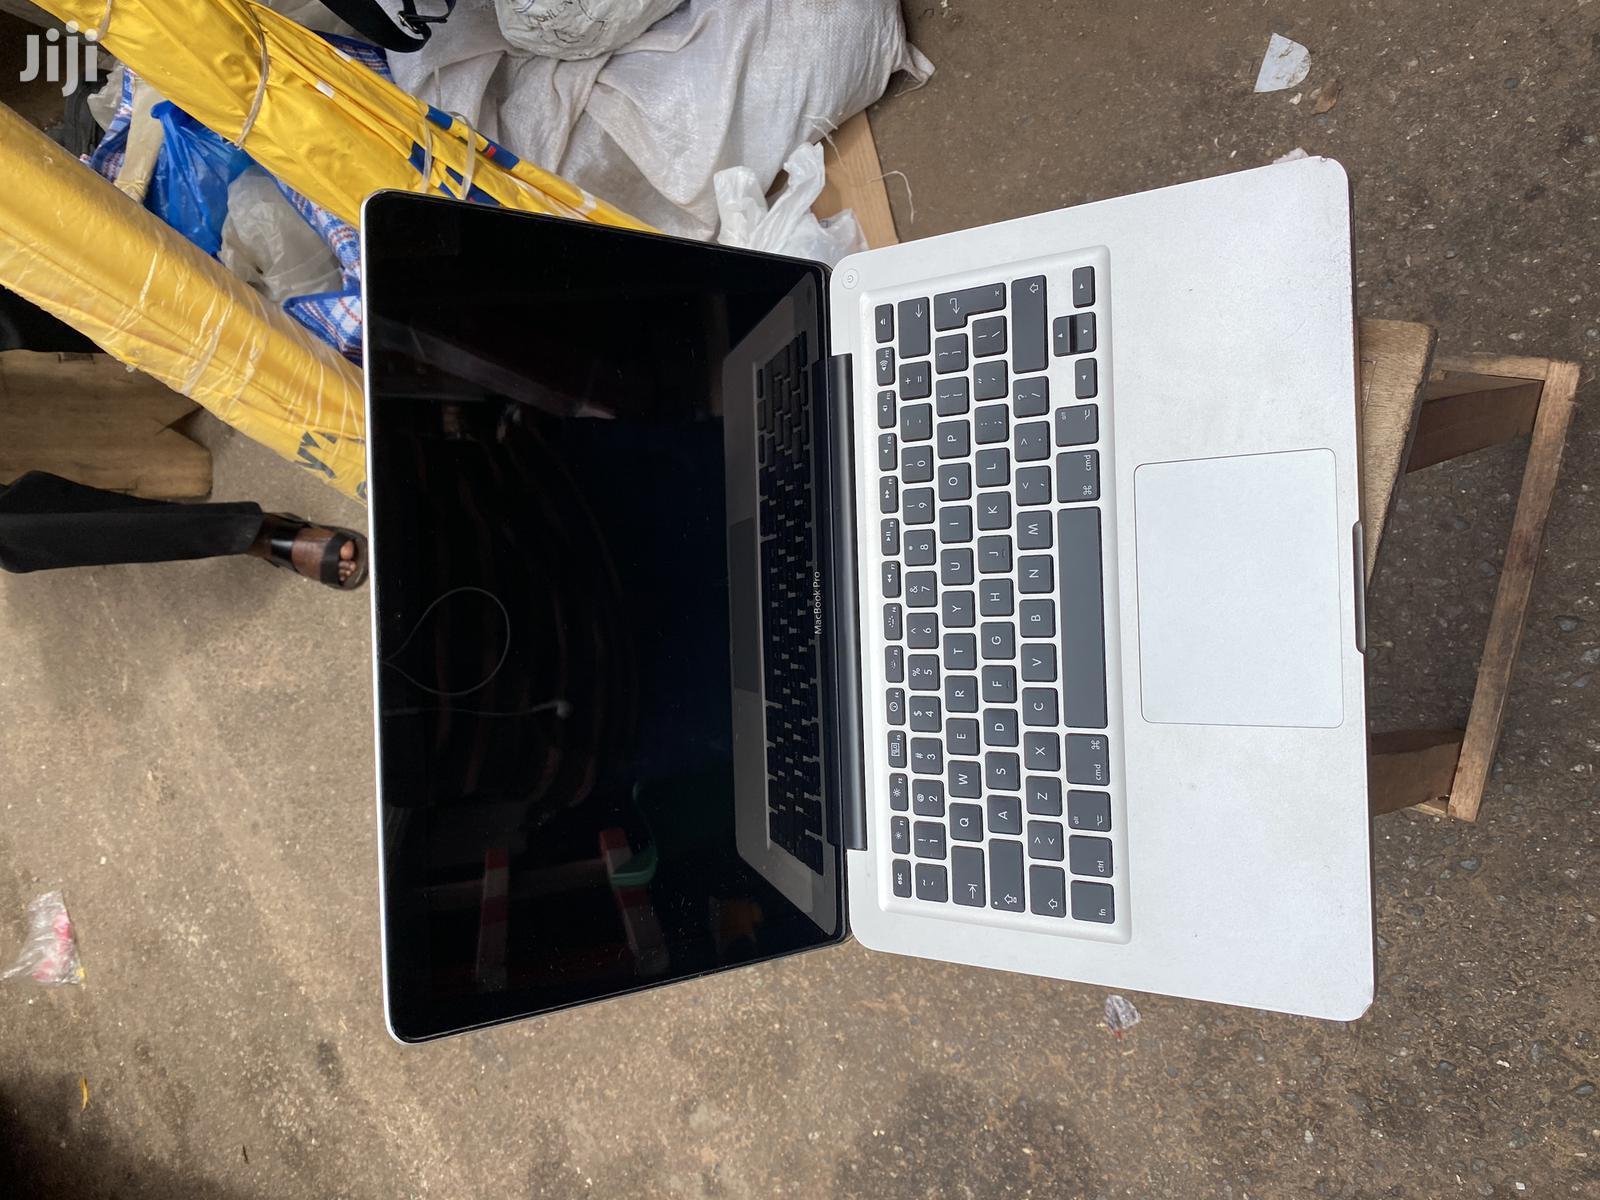 Laptop Apple MacBook Pro 8GB Intel Core I5 SSD 256GB | Laptops & Computers for sale in Kumasi Metropolitan, Ashanti, Ghana